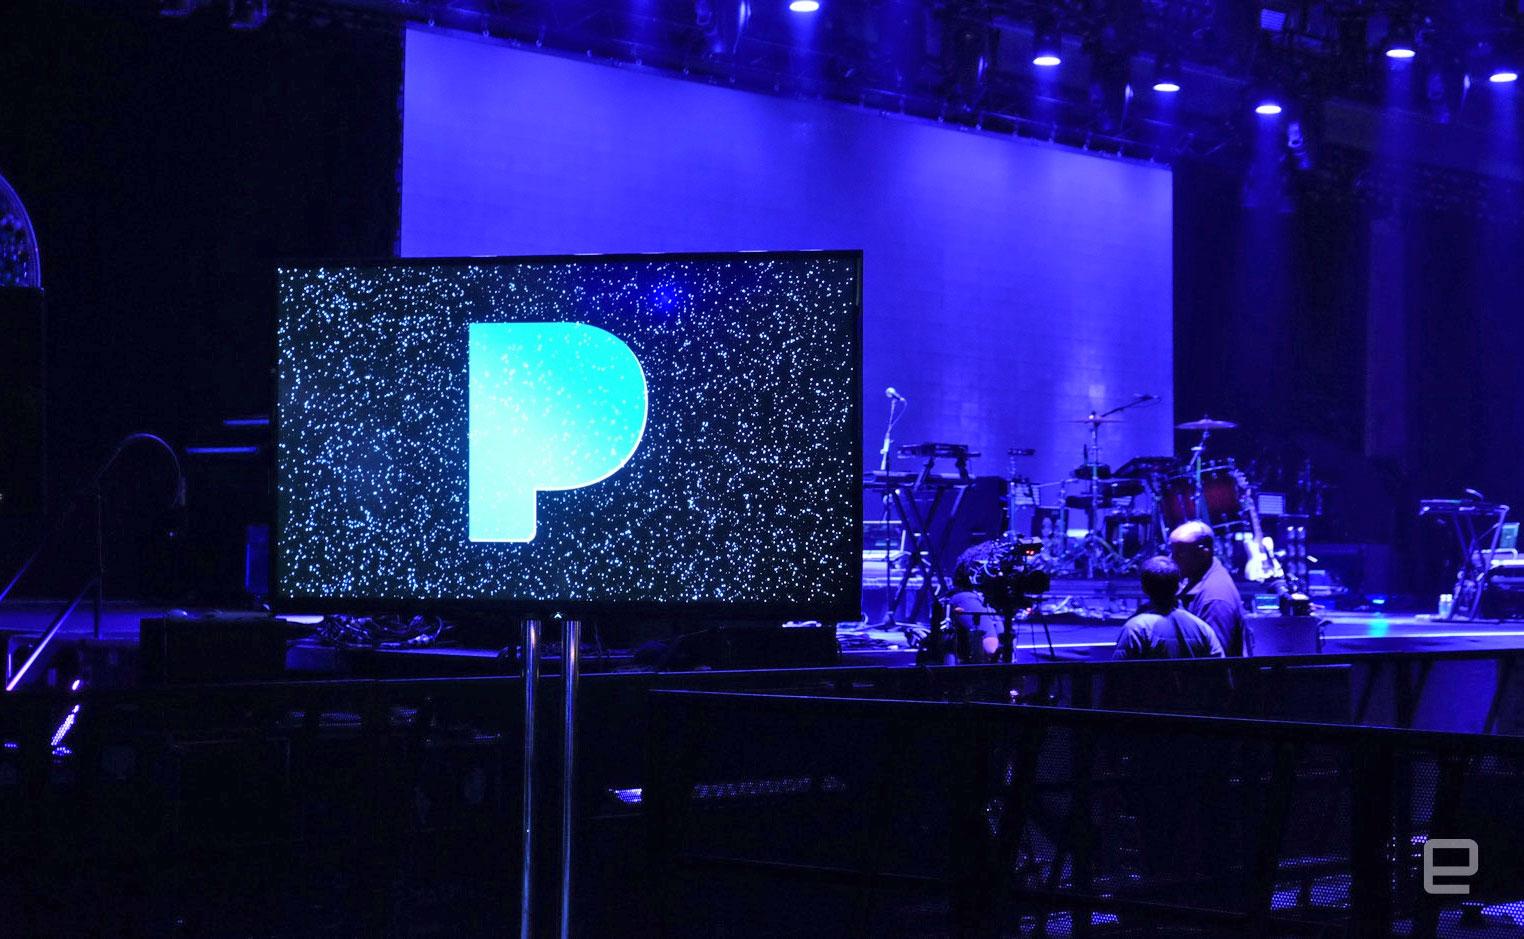 Pandora's radio data now included in Billboard Hot 100